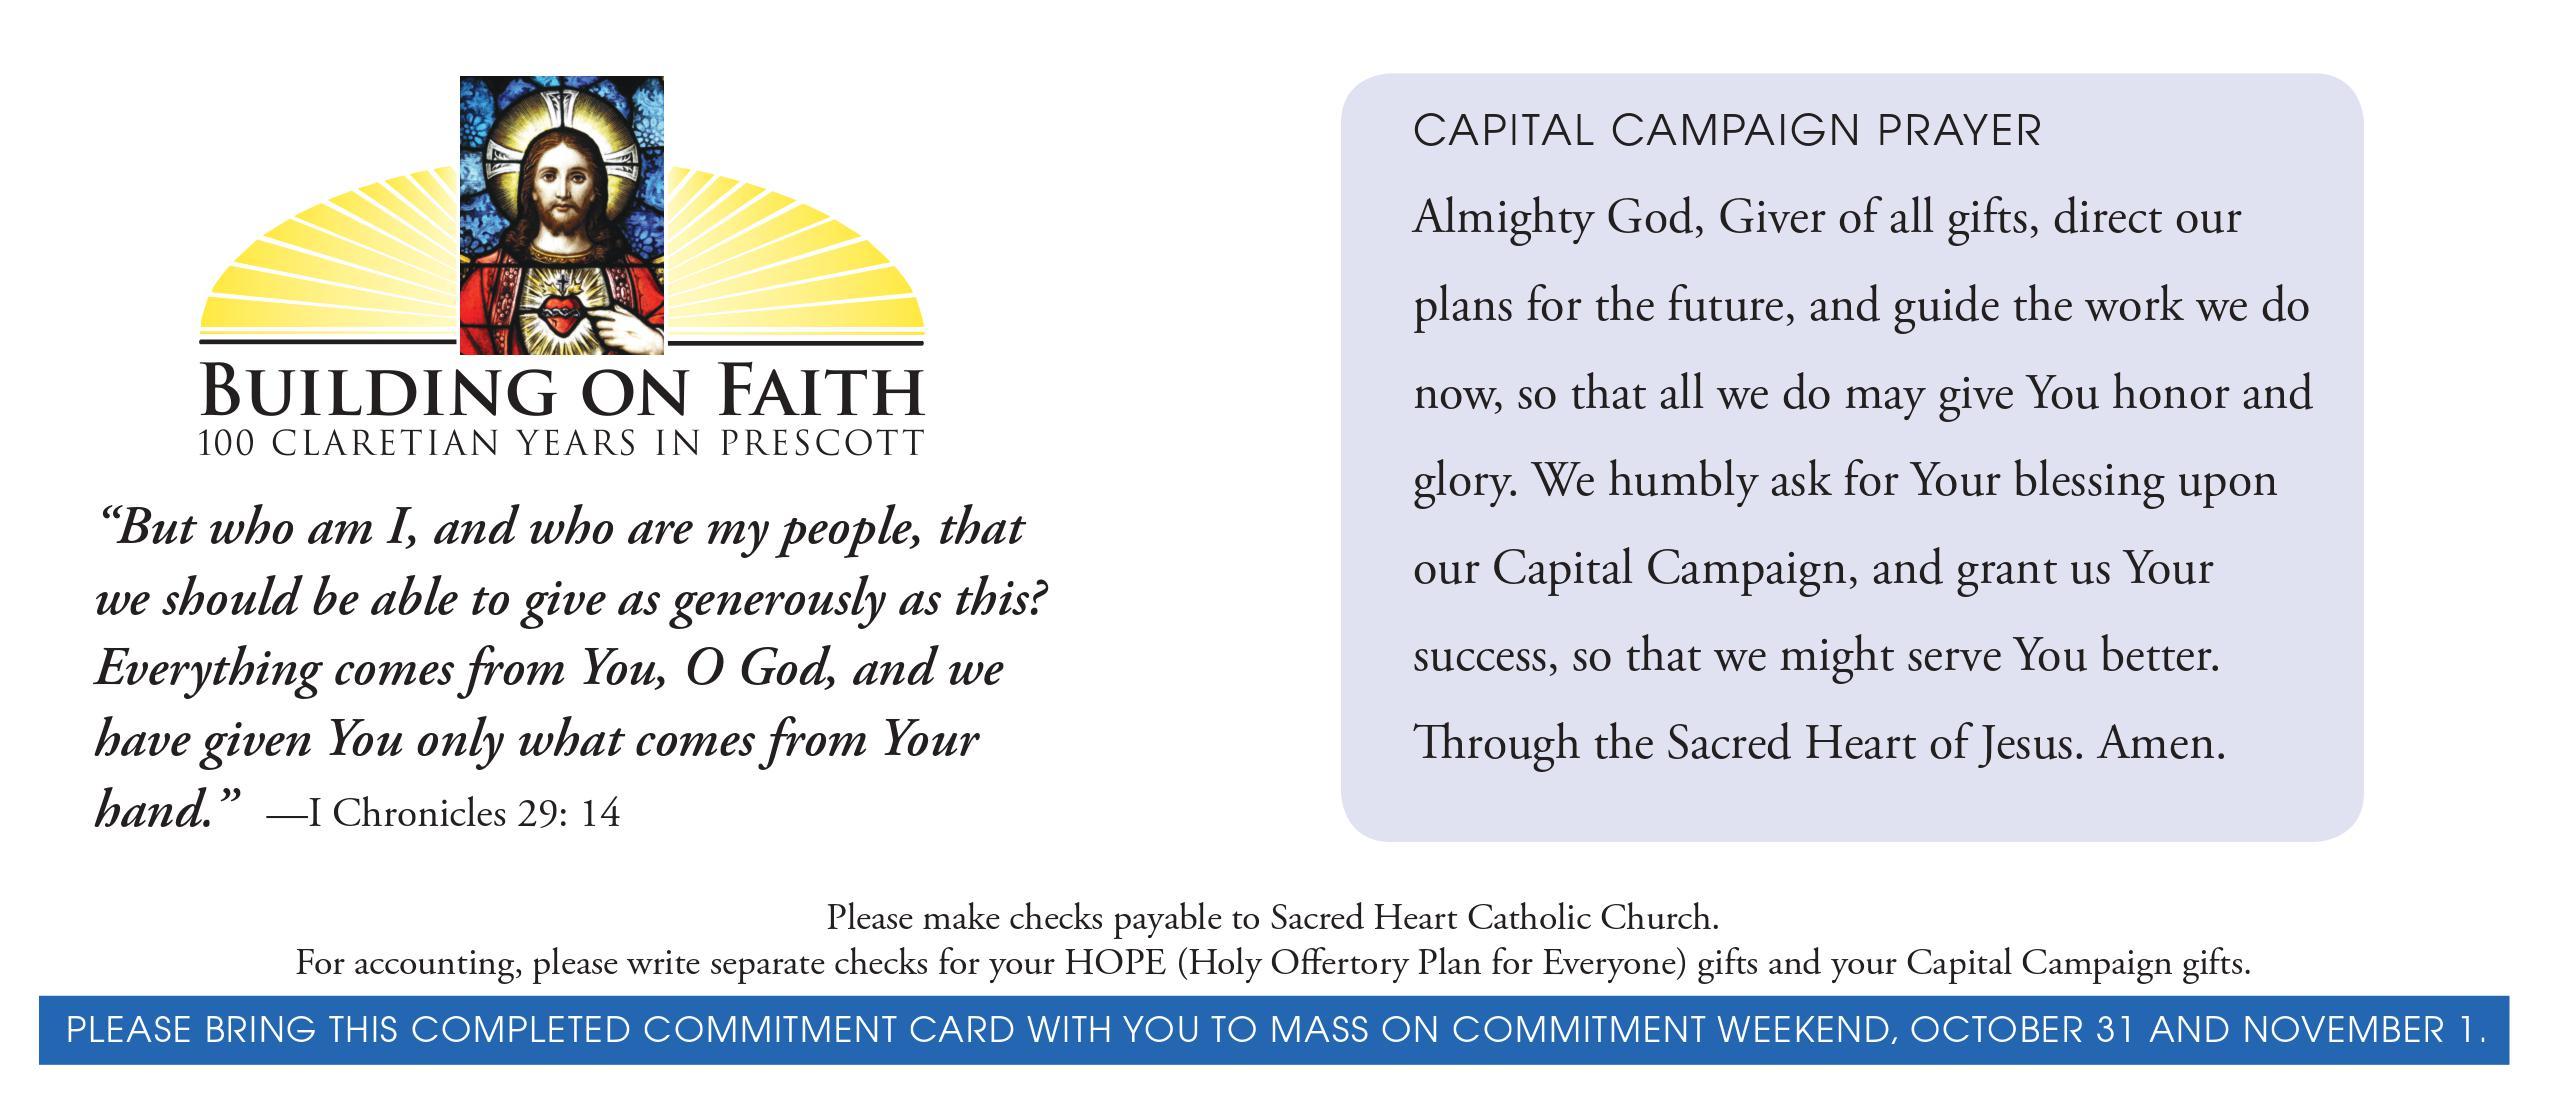 Church Capital Campaign Pledge Card